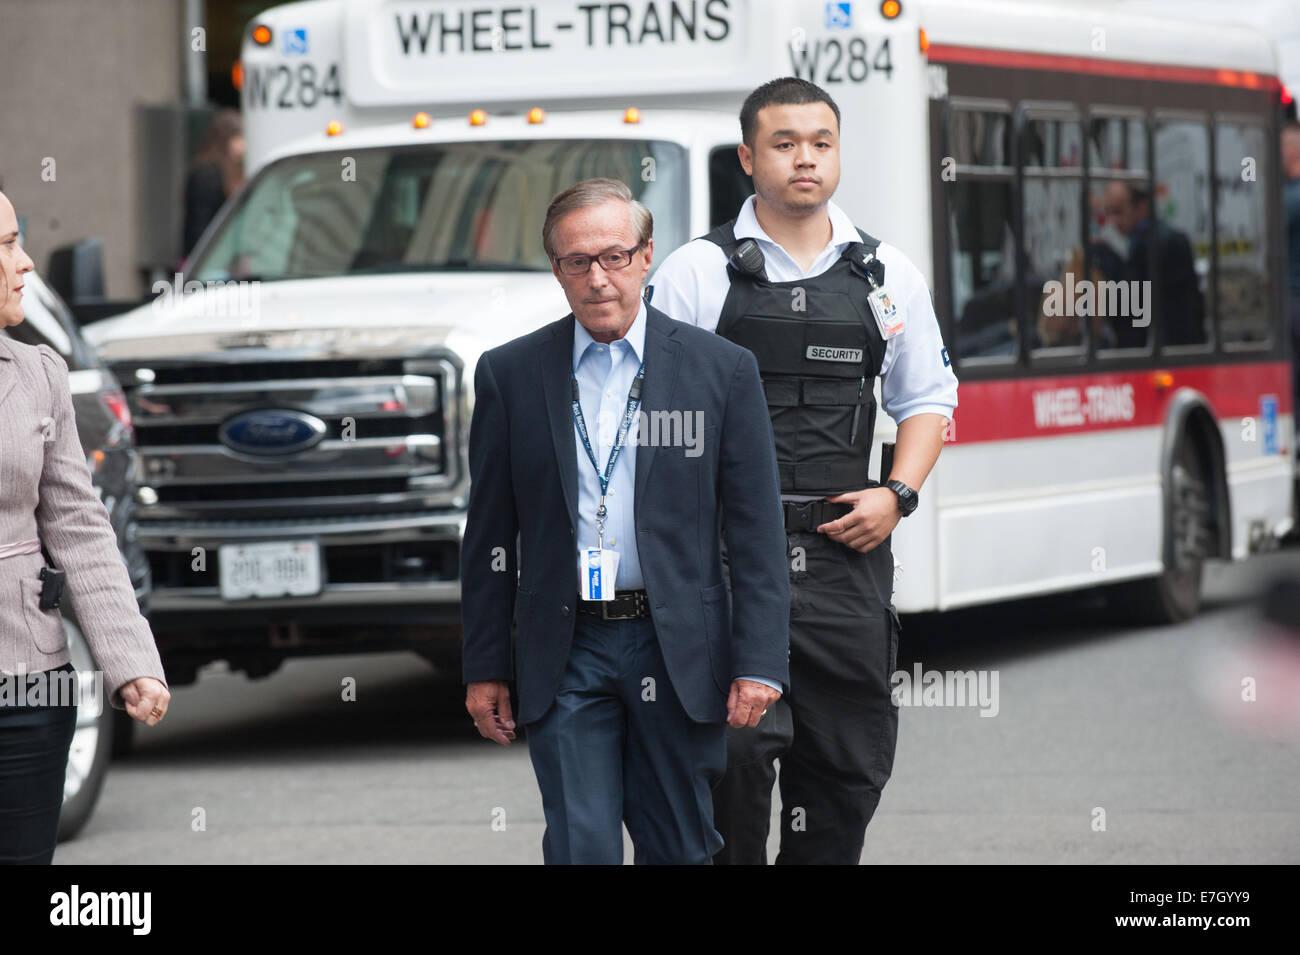 Toronto, CAN , 17 Sep 2014 - Doctor Zane Cohn of Mount Sinai